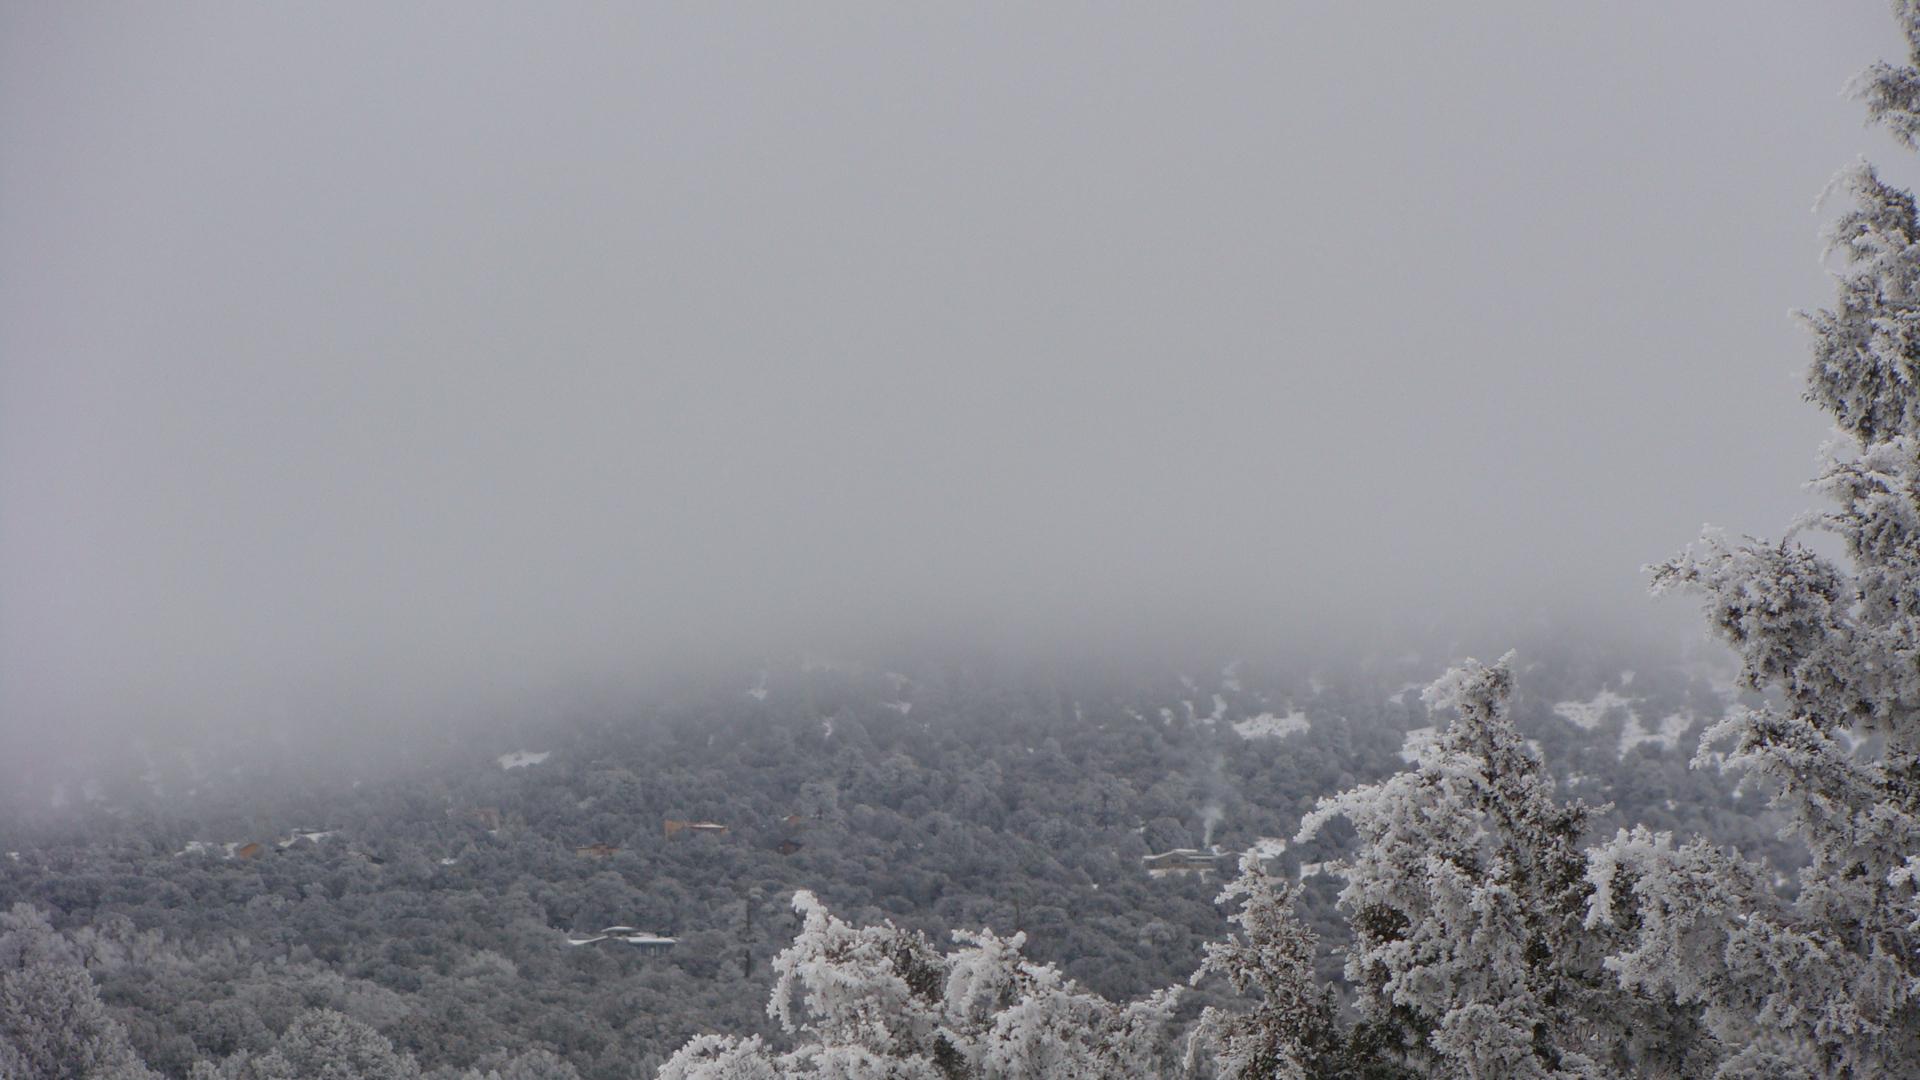 snowy foggy trees